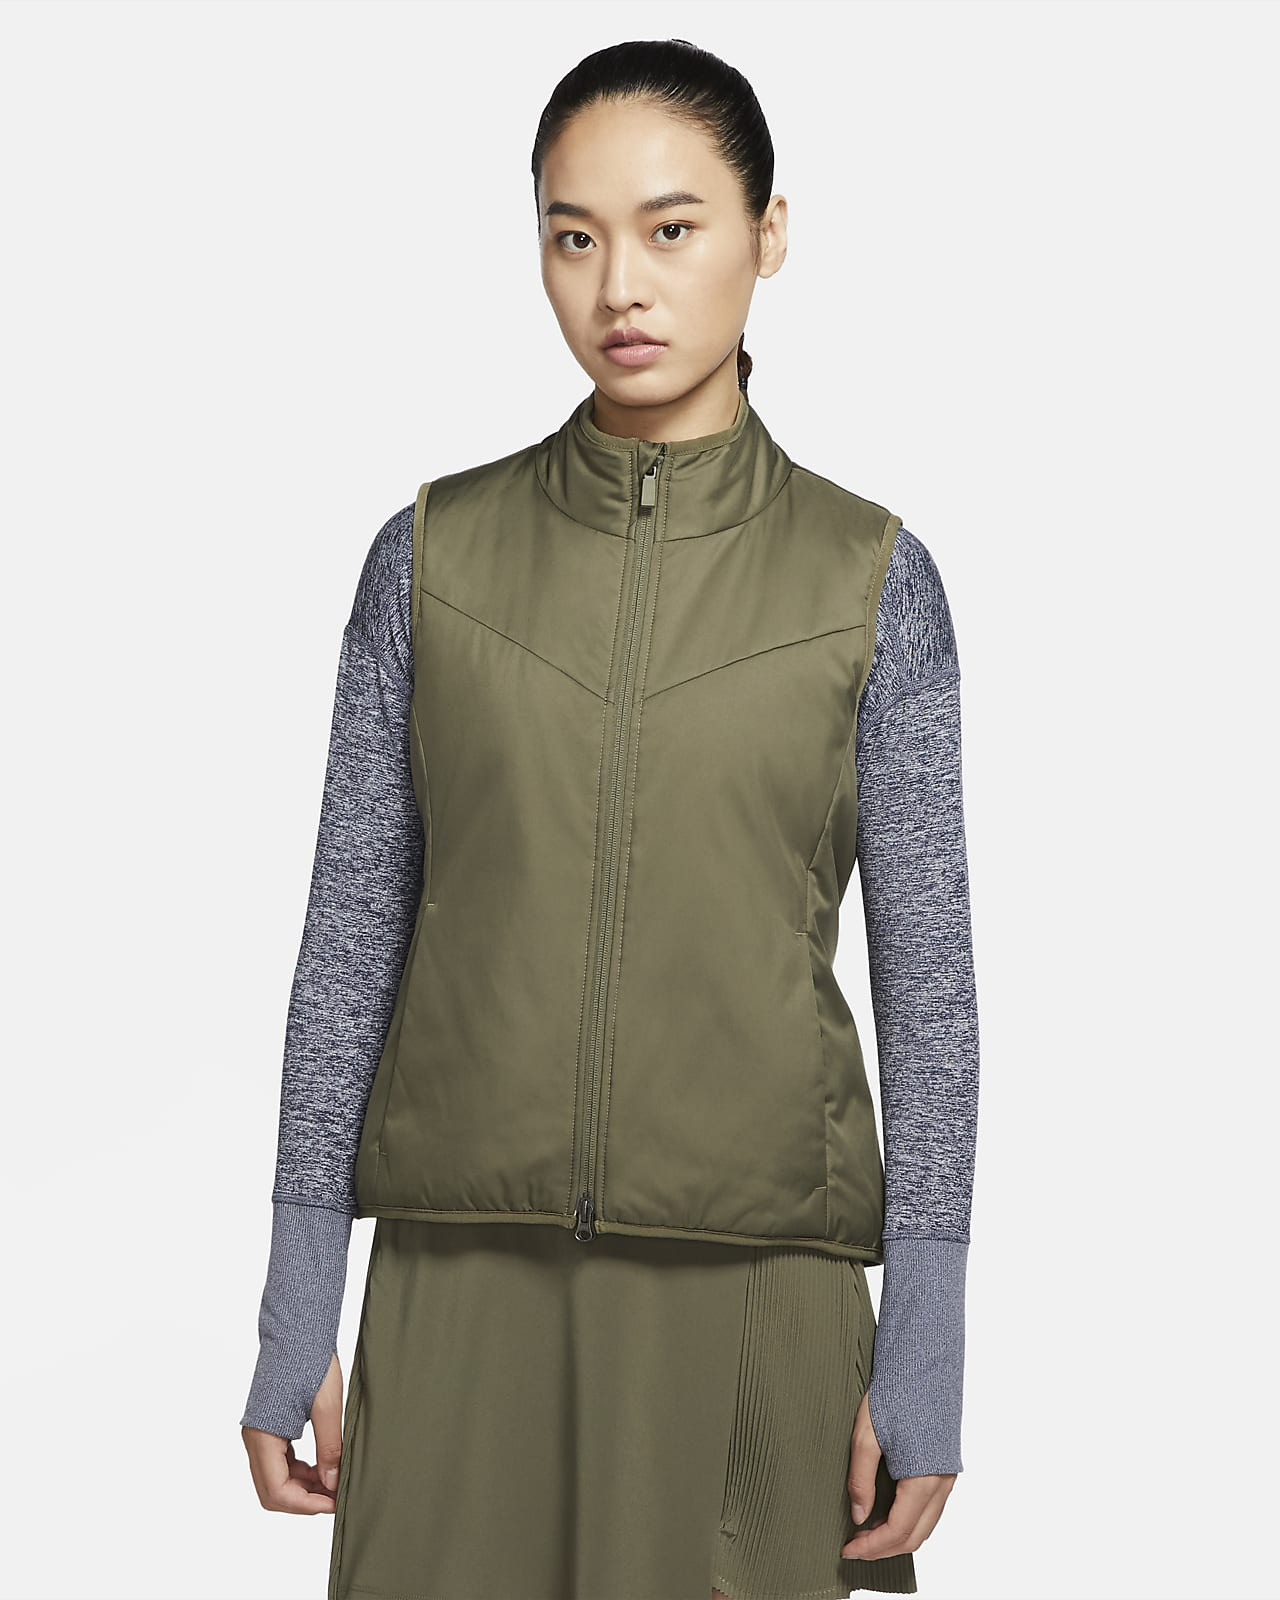 Nike Women's Reversible Synthetic Filled Golf Vest